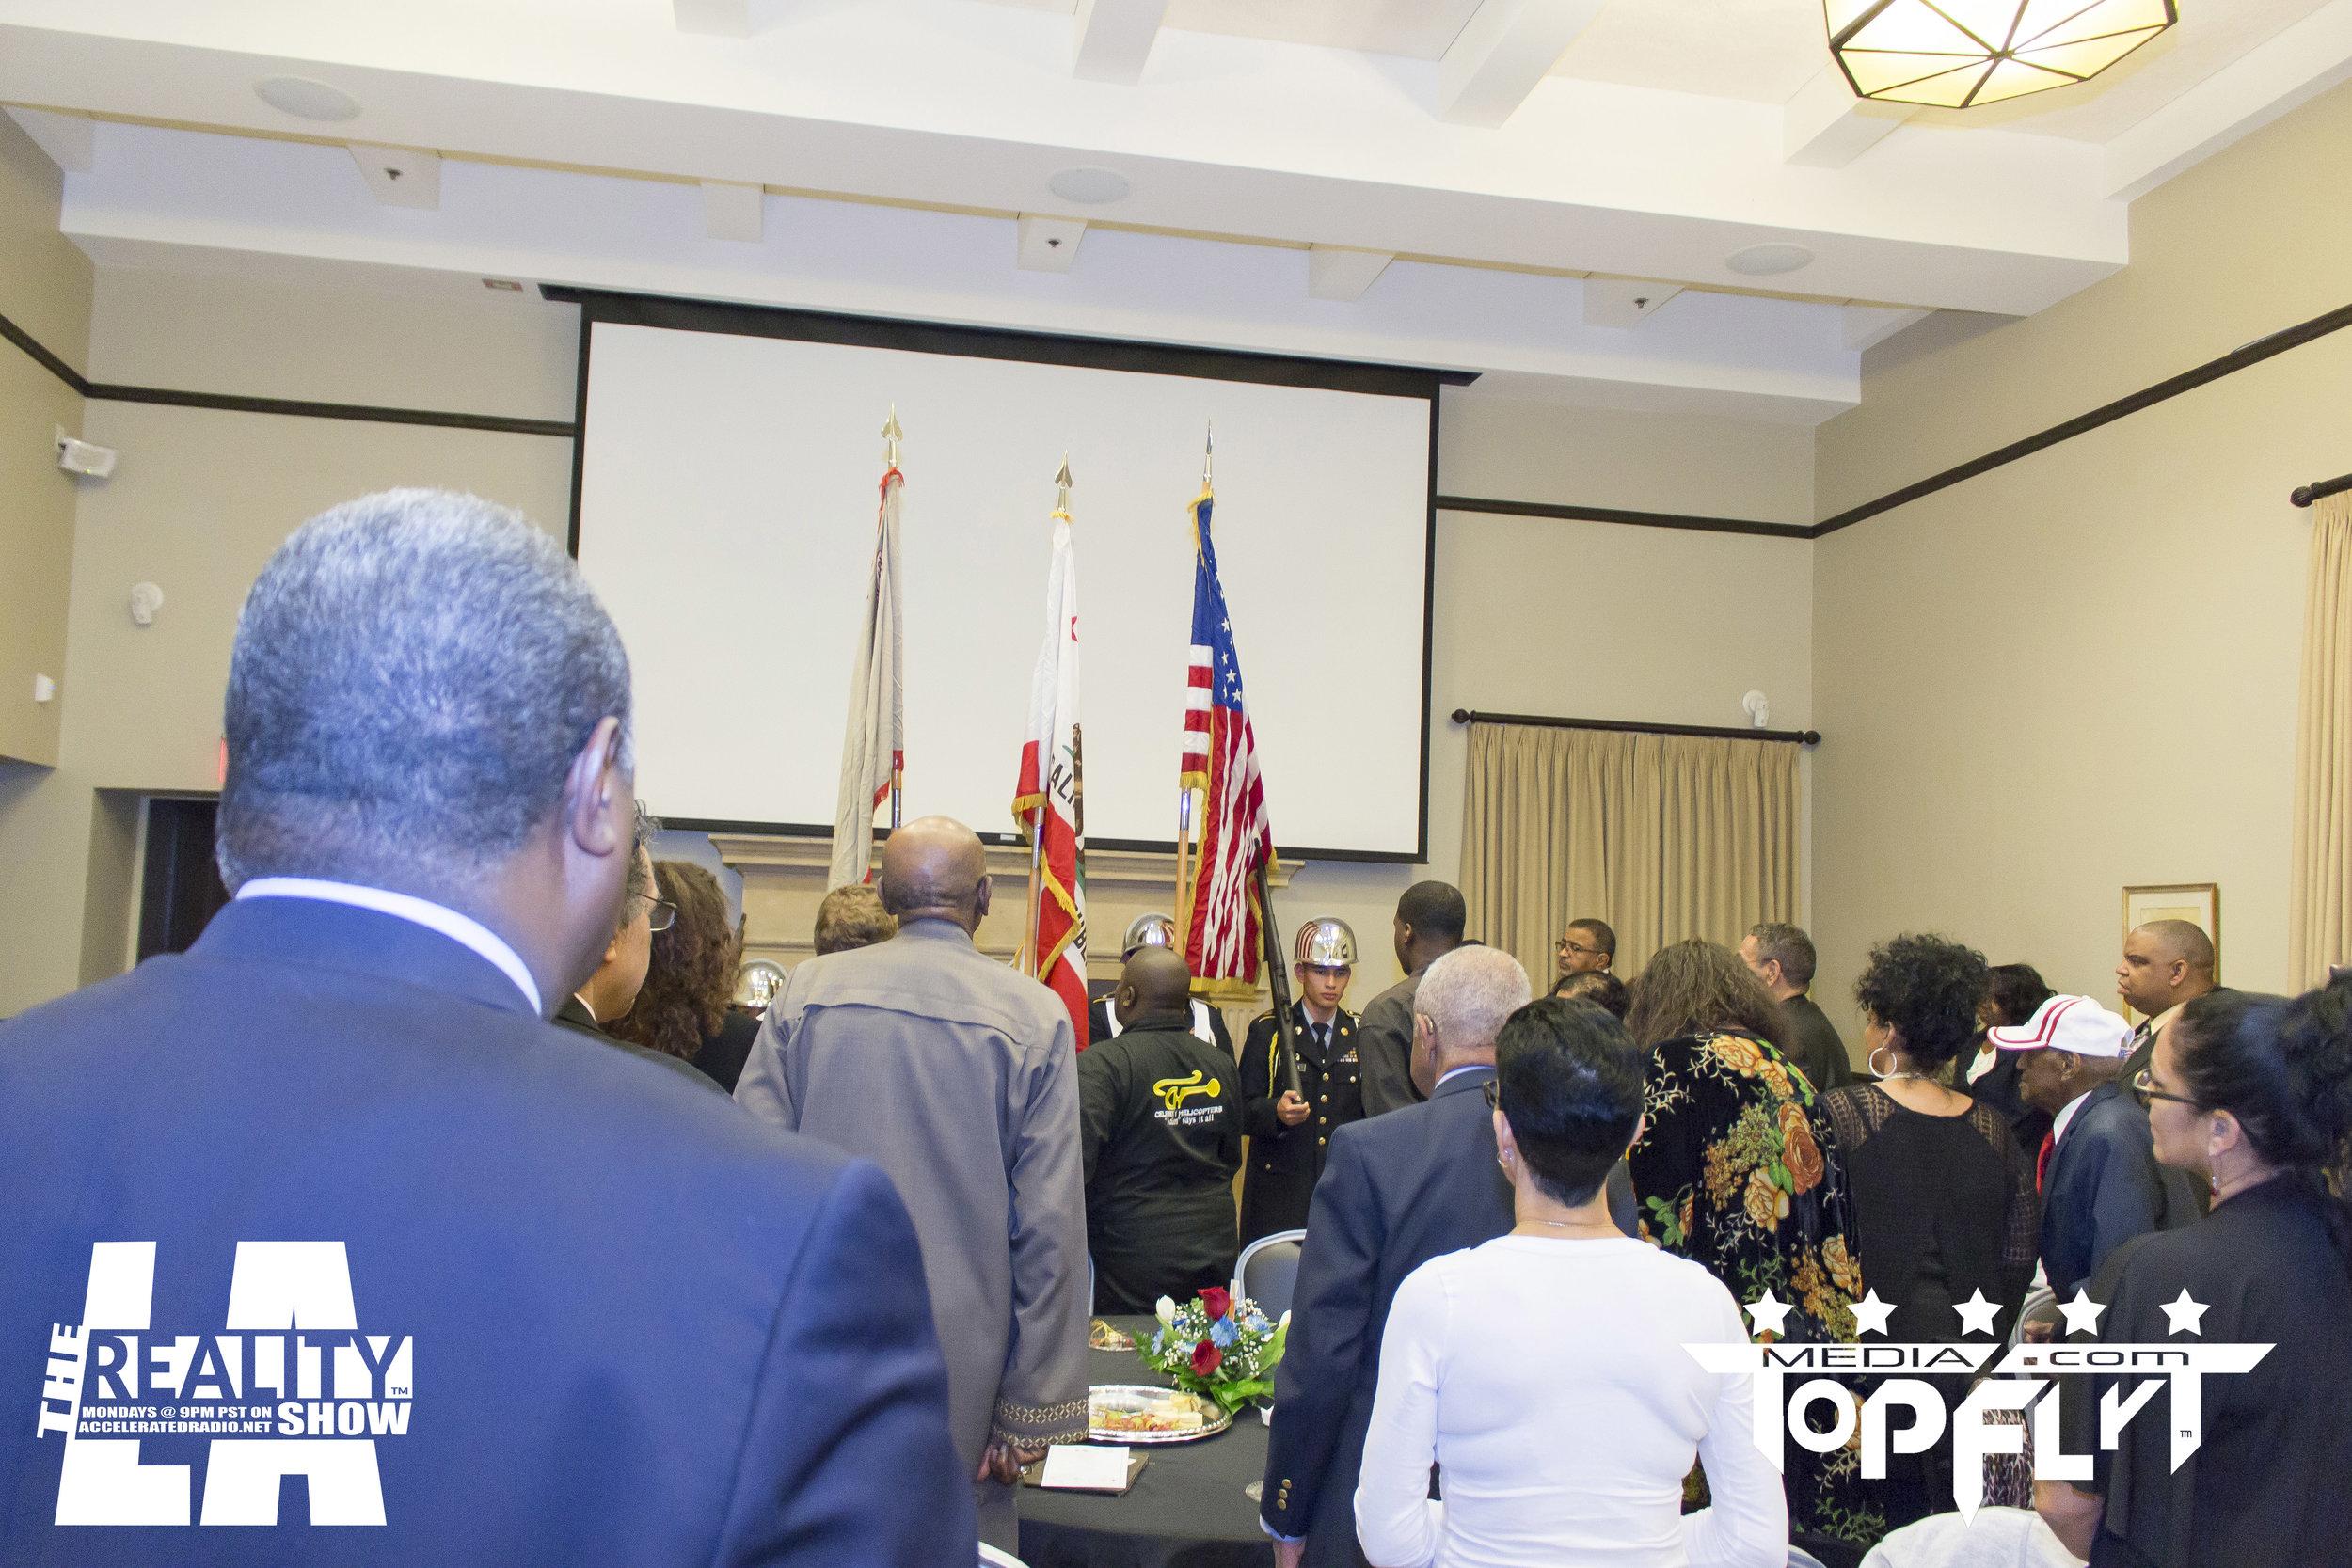 The Reality Show LA - Tuskegee Airmen 75th Anniversary VIP Reception_86.jpg